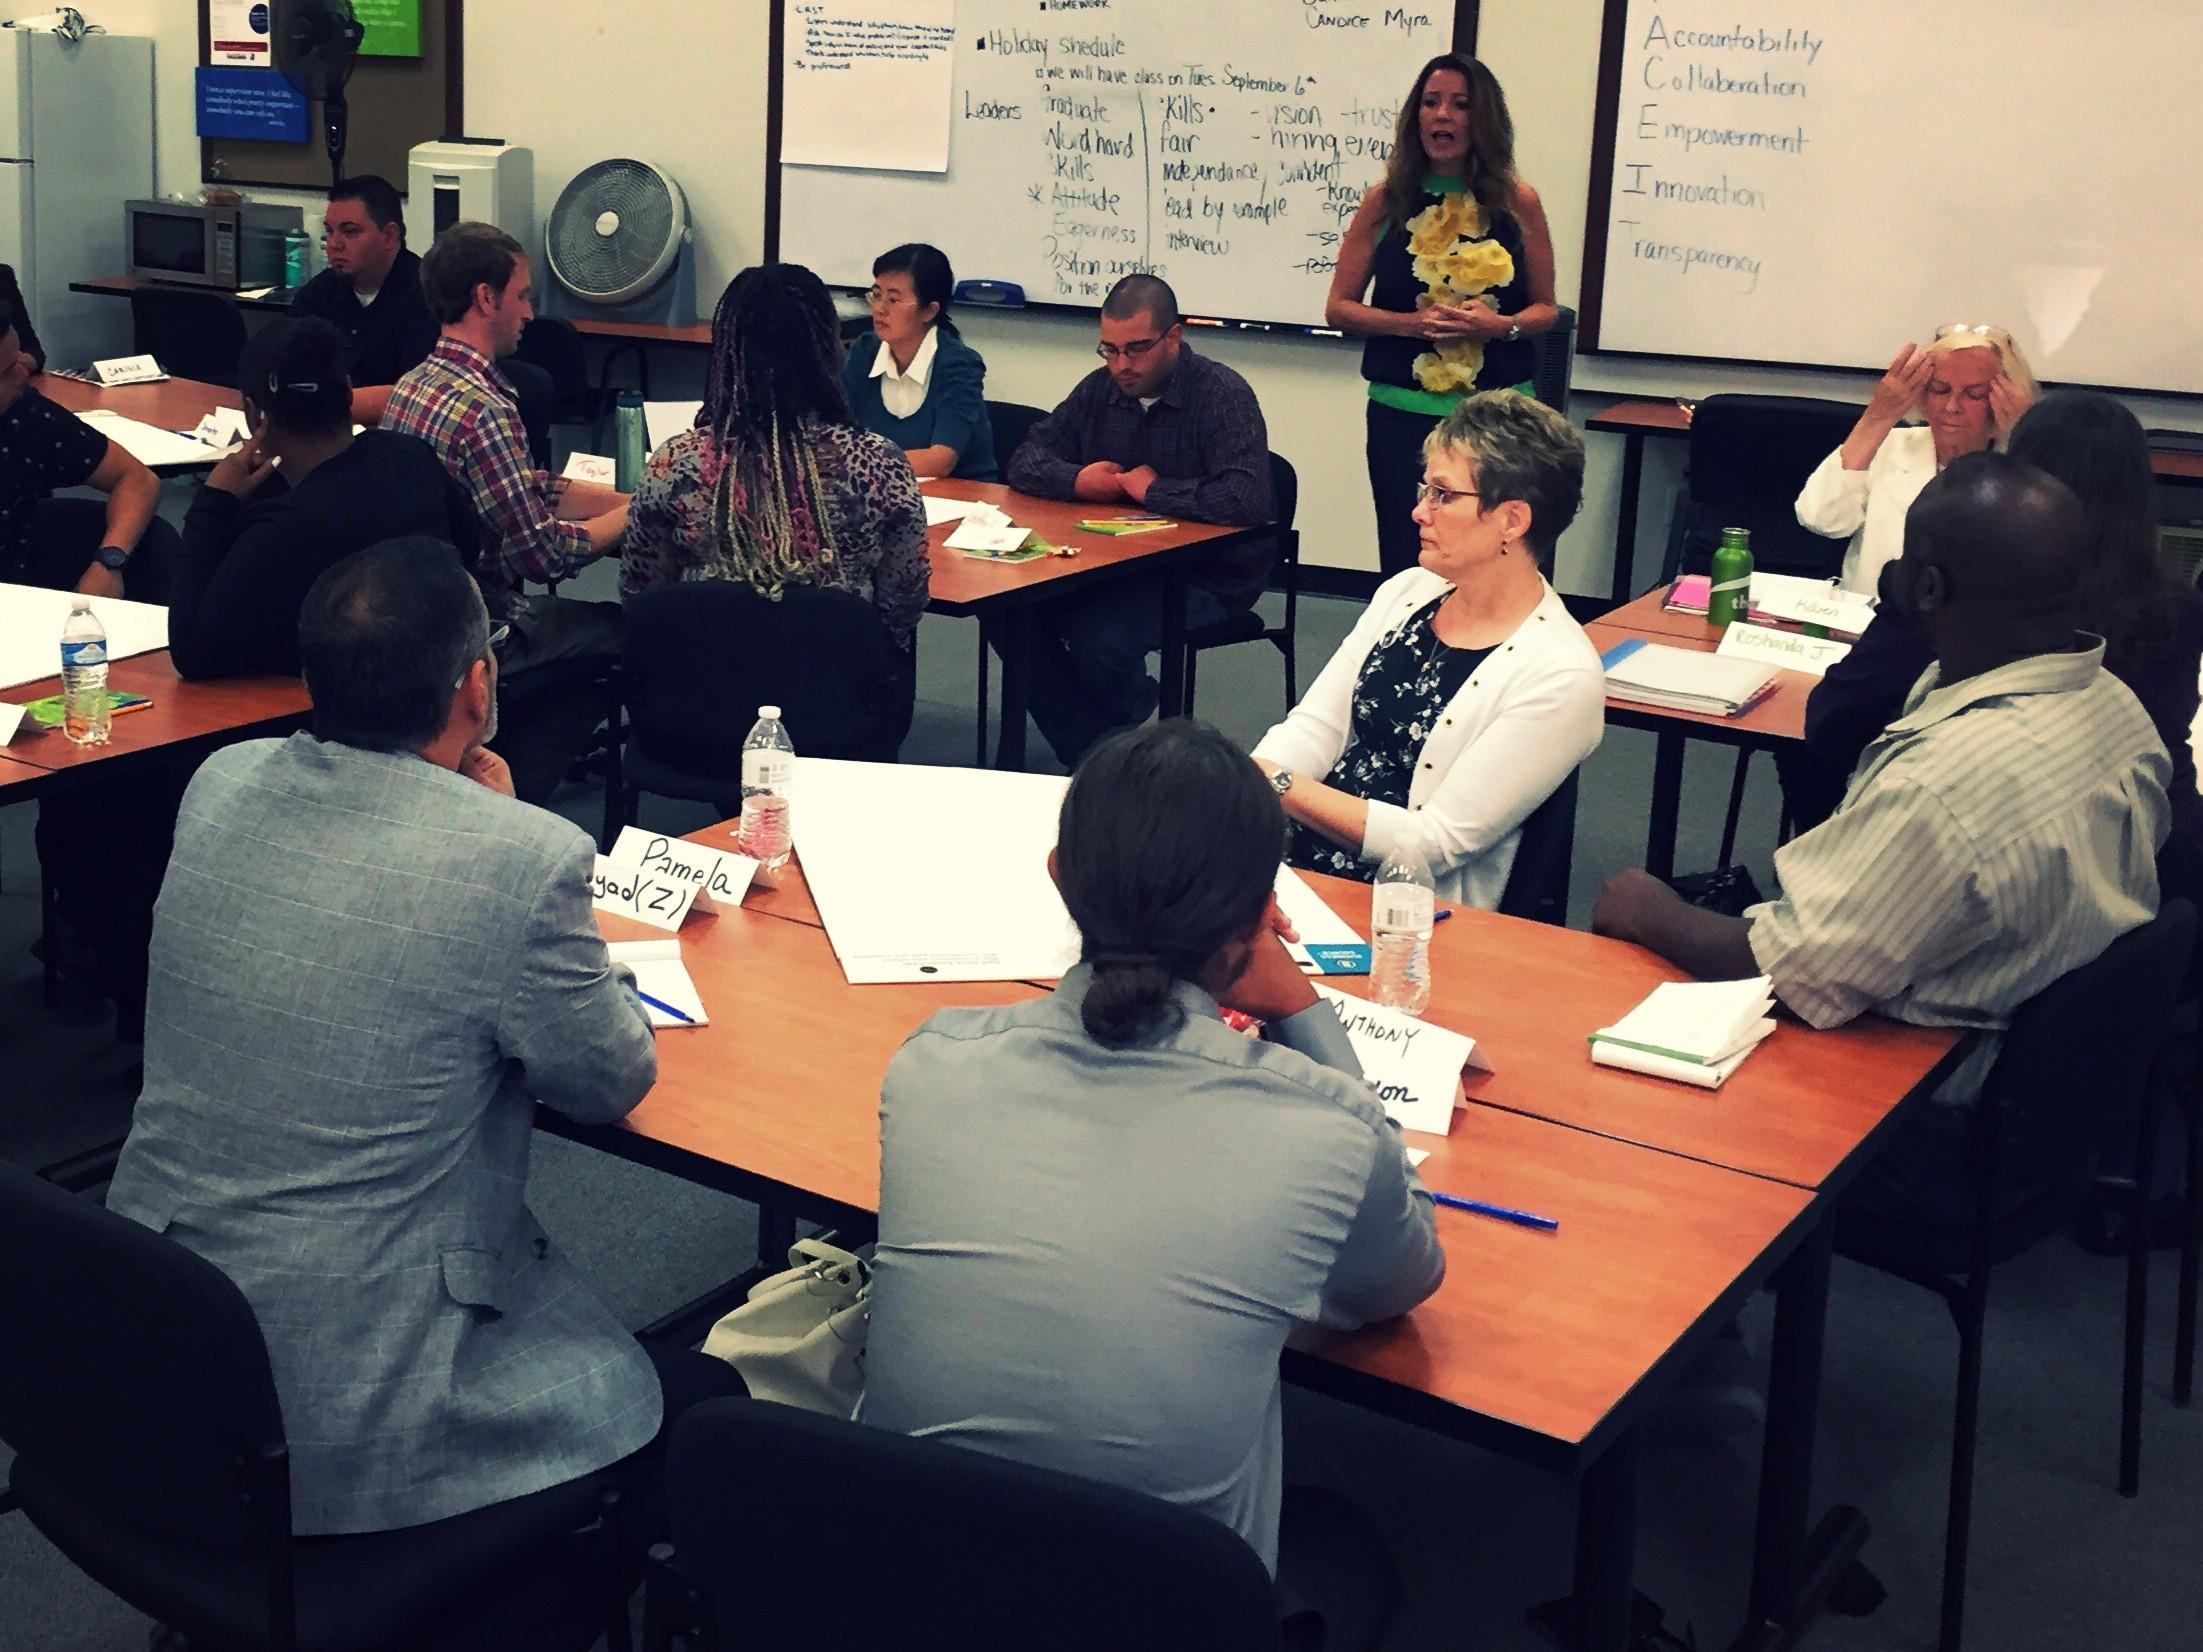 Goodwill opens Bankwork$ job training program